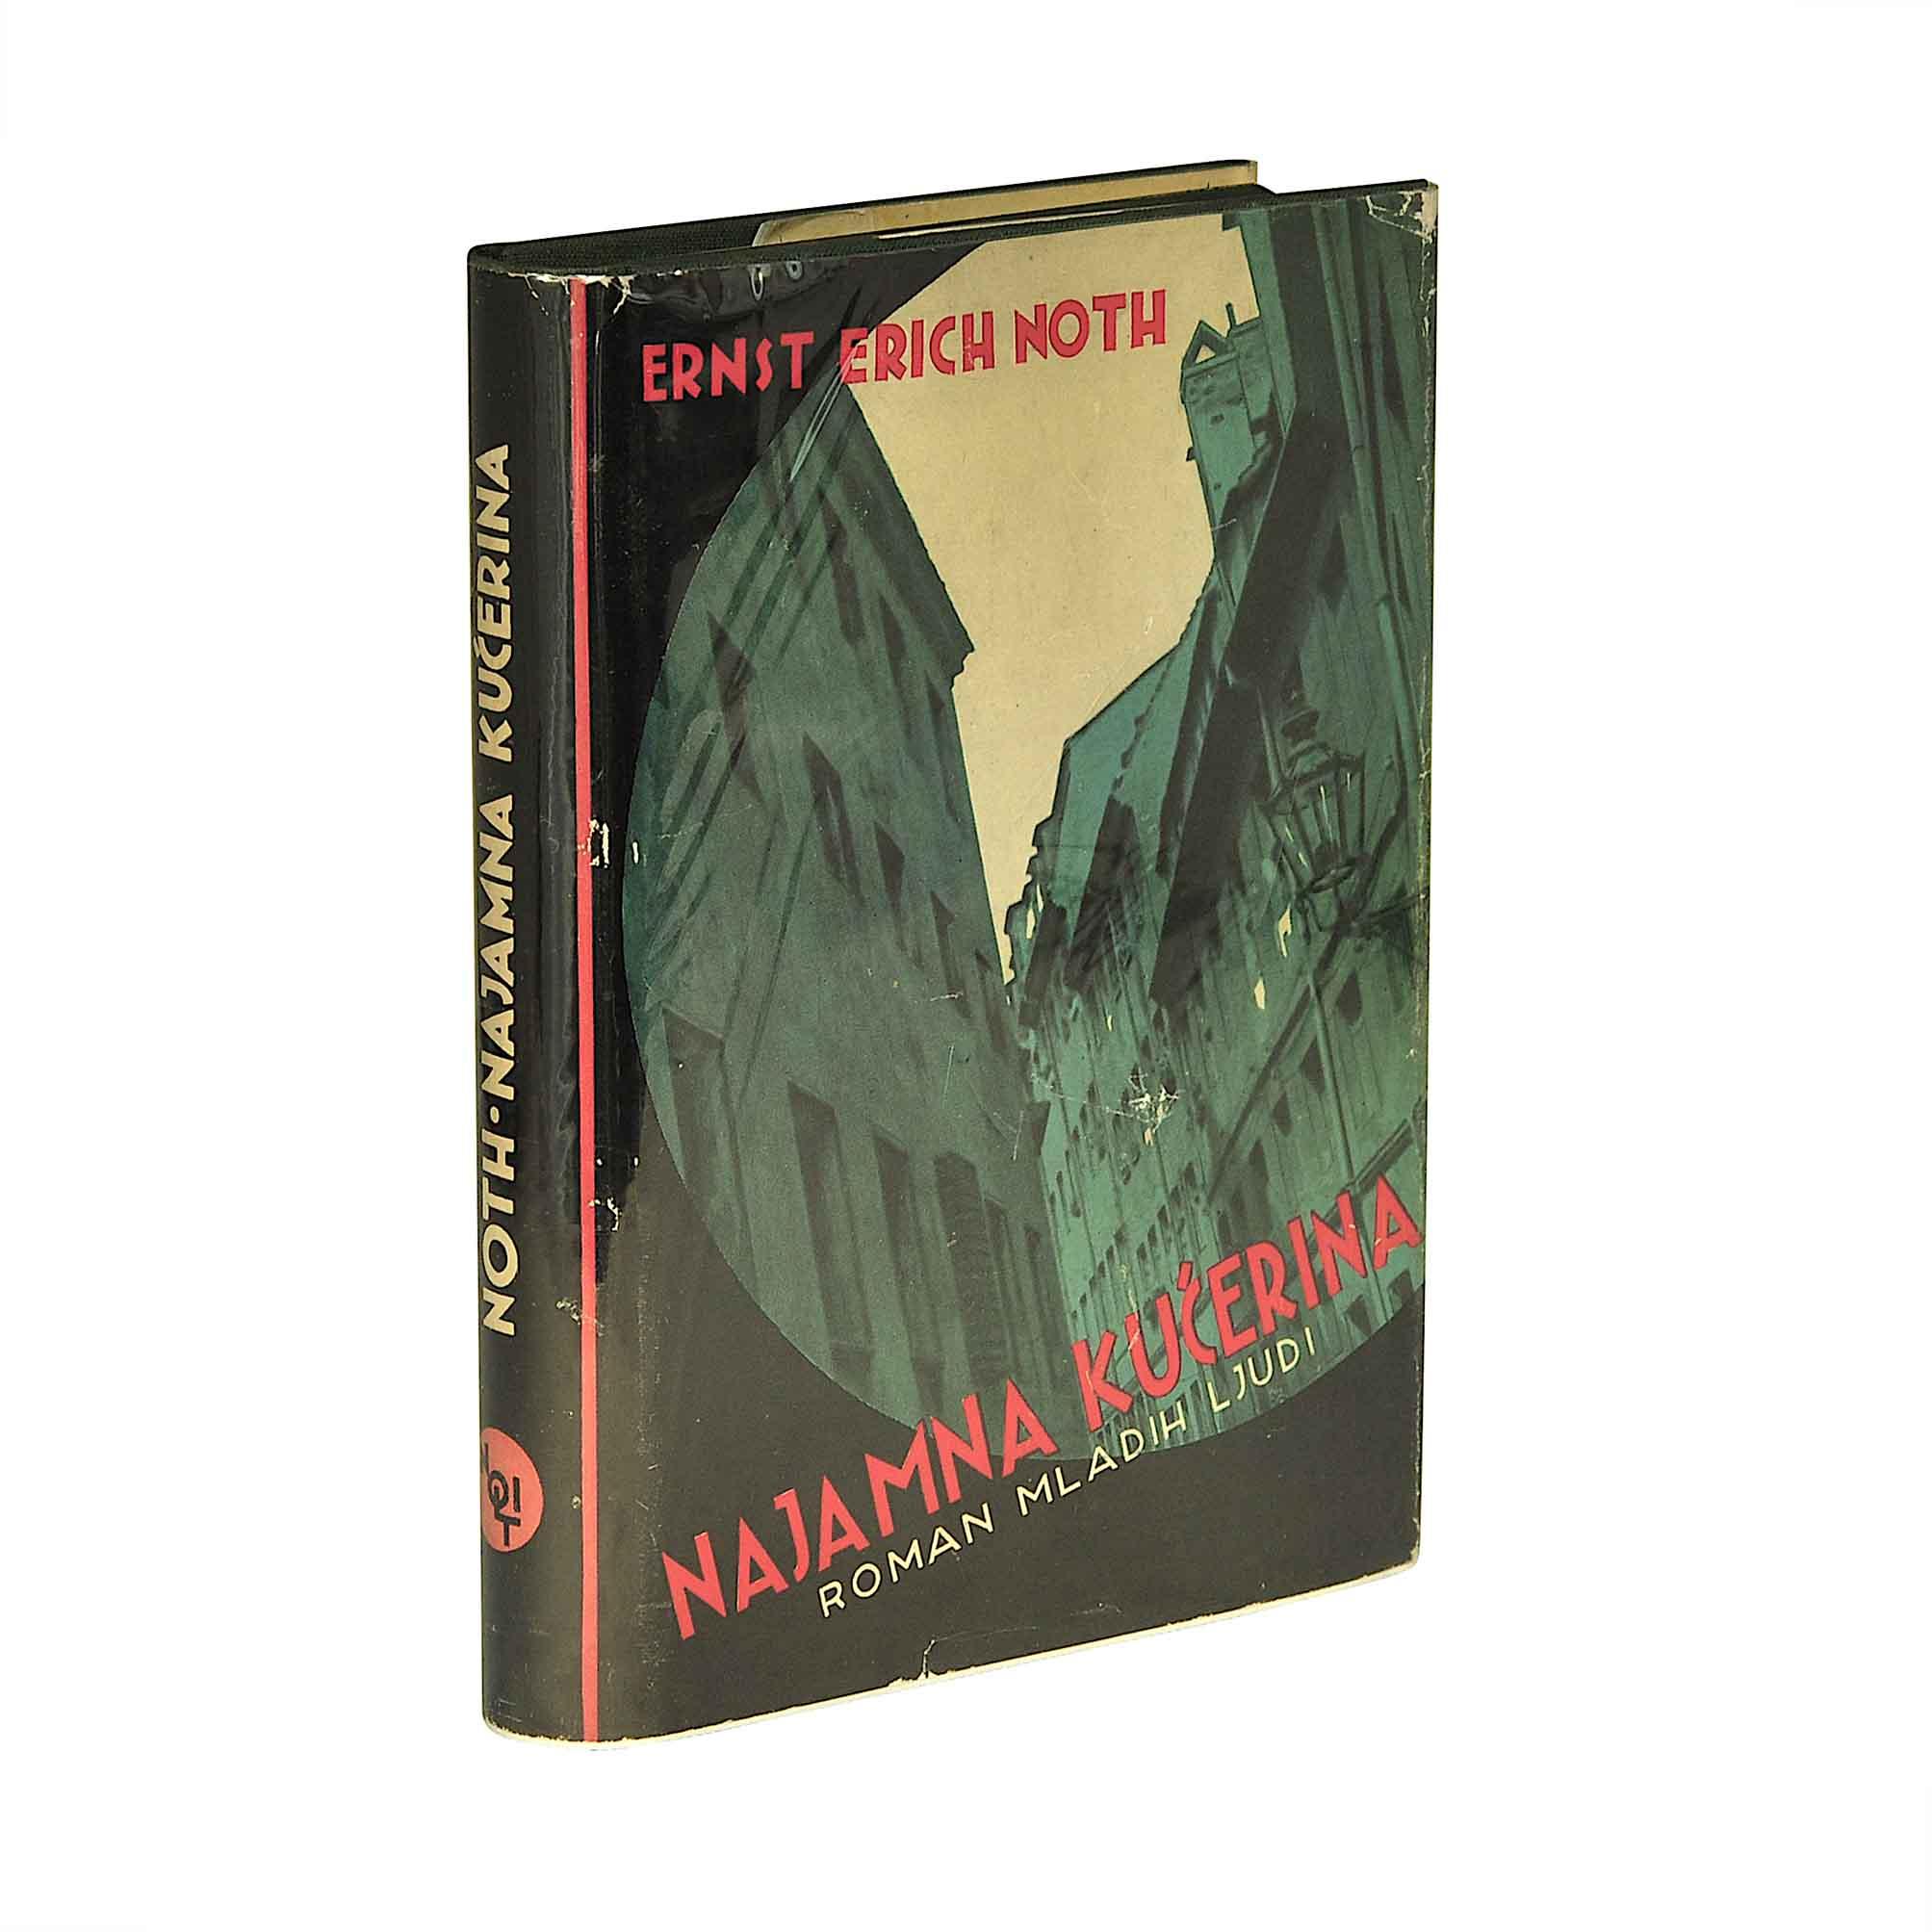 5653-Noth-Bihaly-Najamna-Kucerina-Nolit-1933-Umschlag-recto-Rücken-A-N.jpg